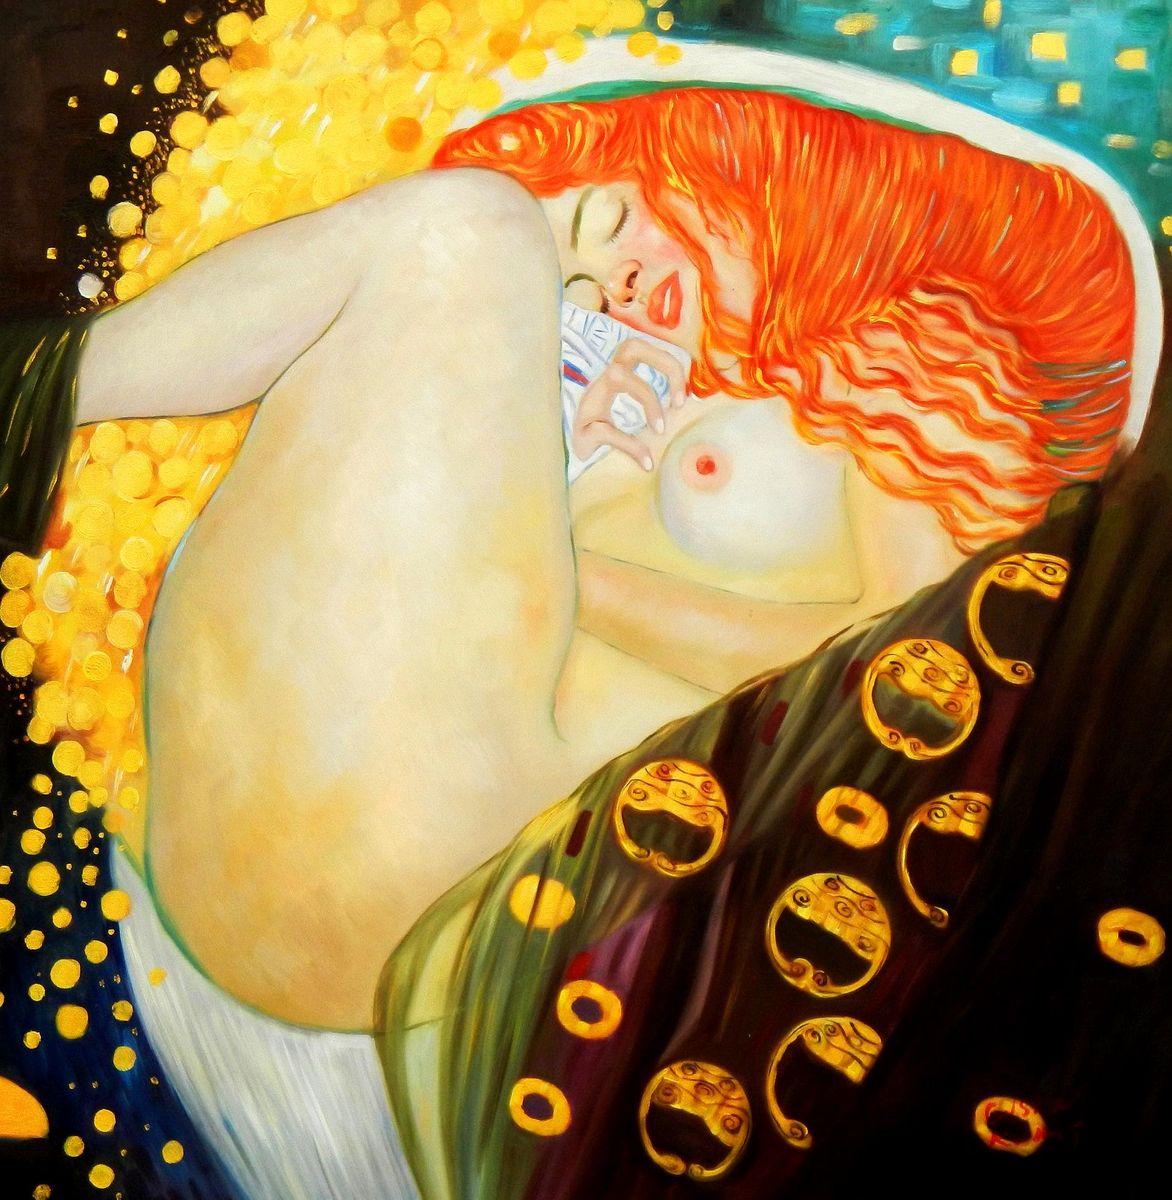 Gustav Klimt - Danae g94646 80x80cm exquisites Ölgemälde